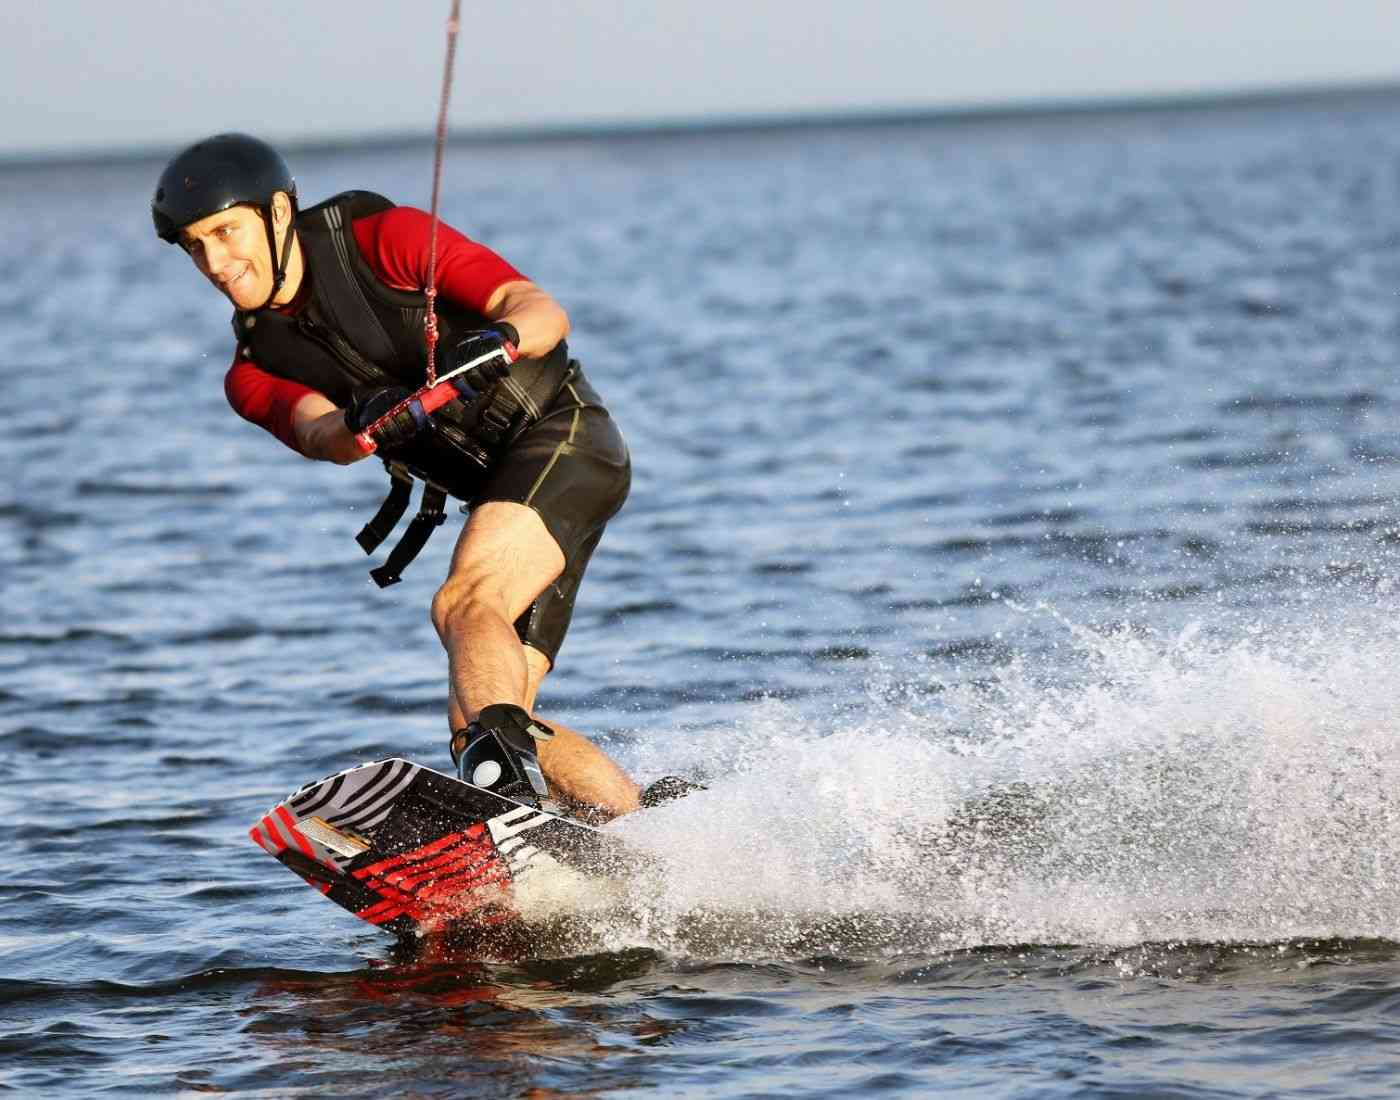 Water Skiing sports